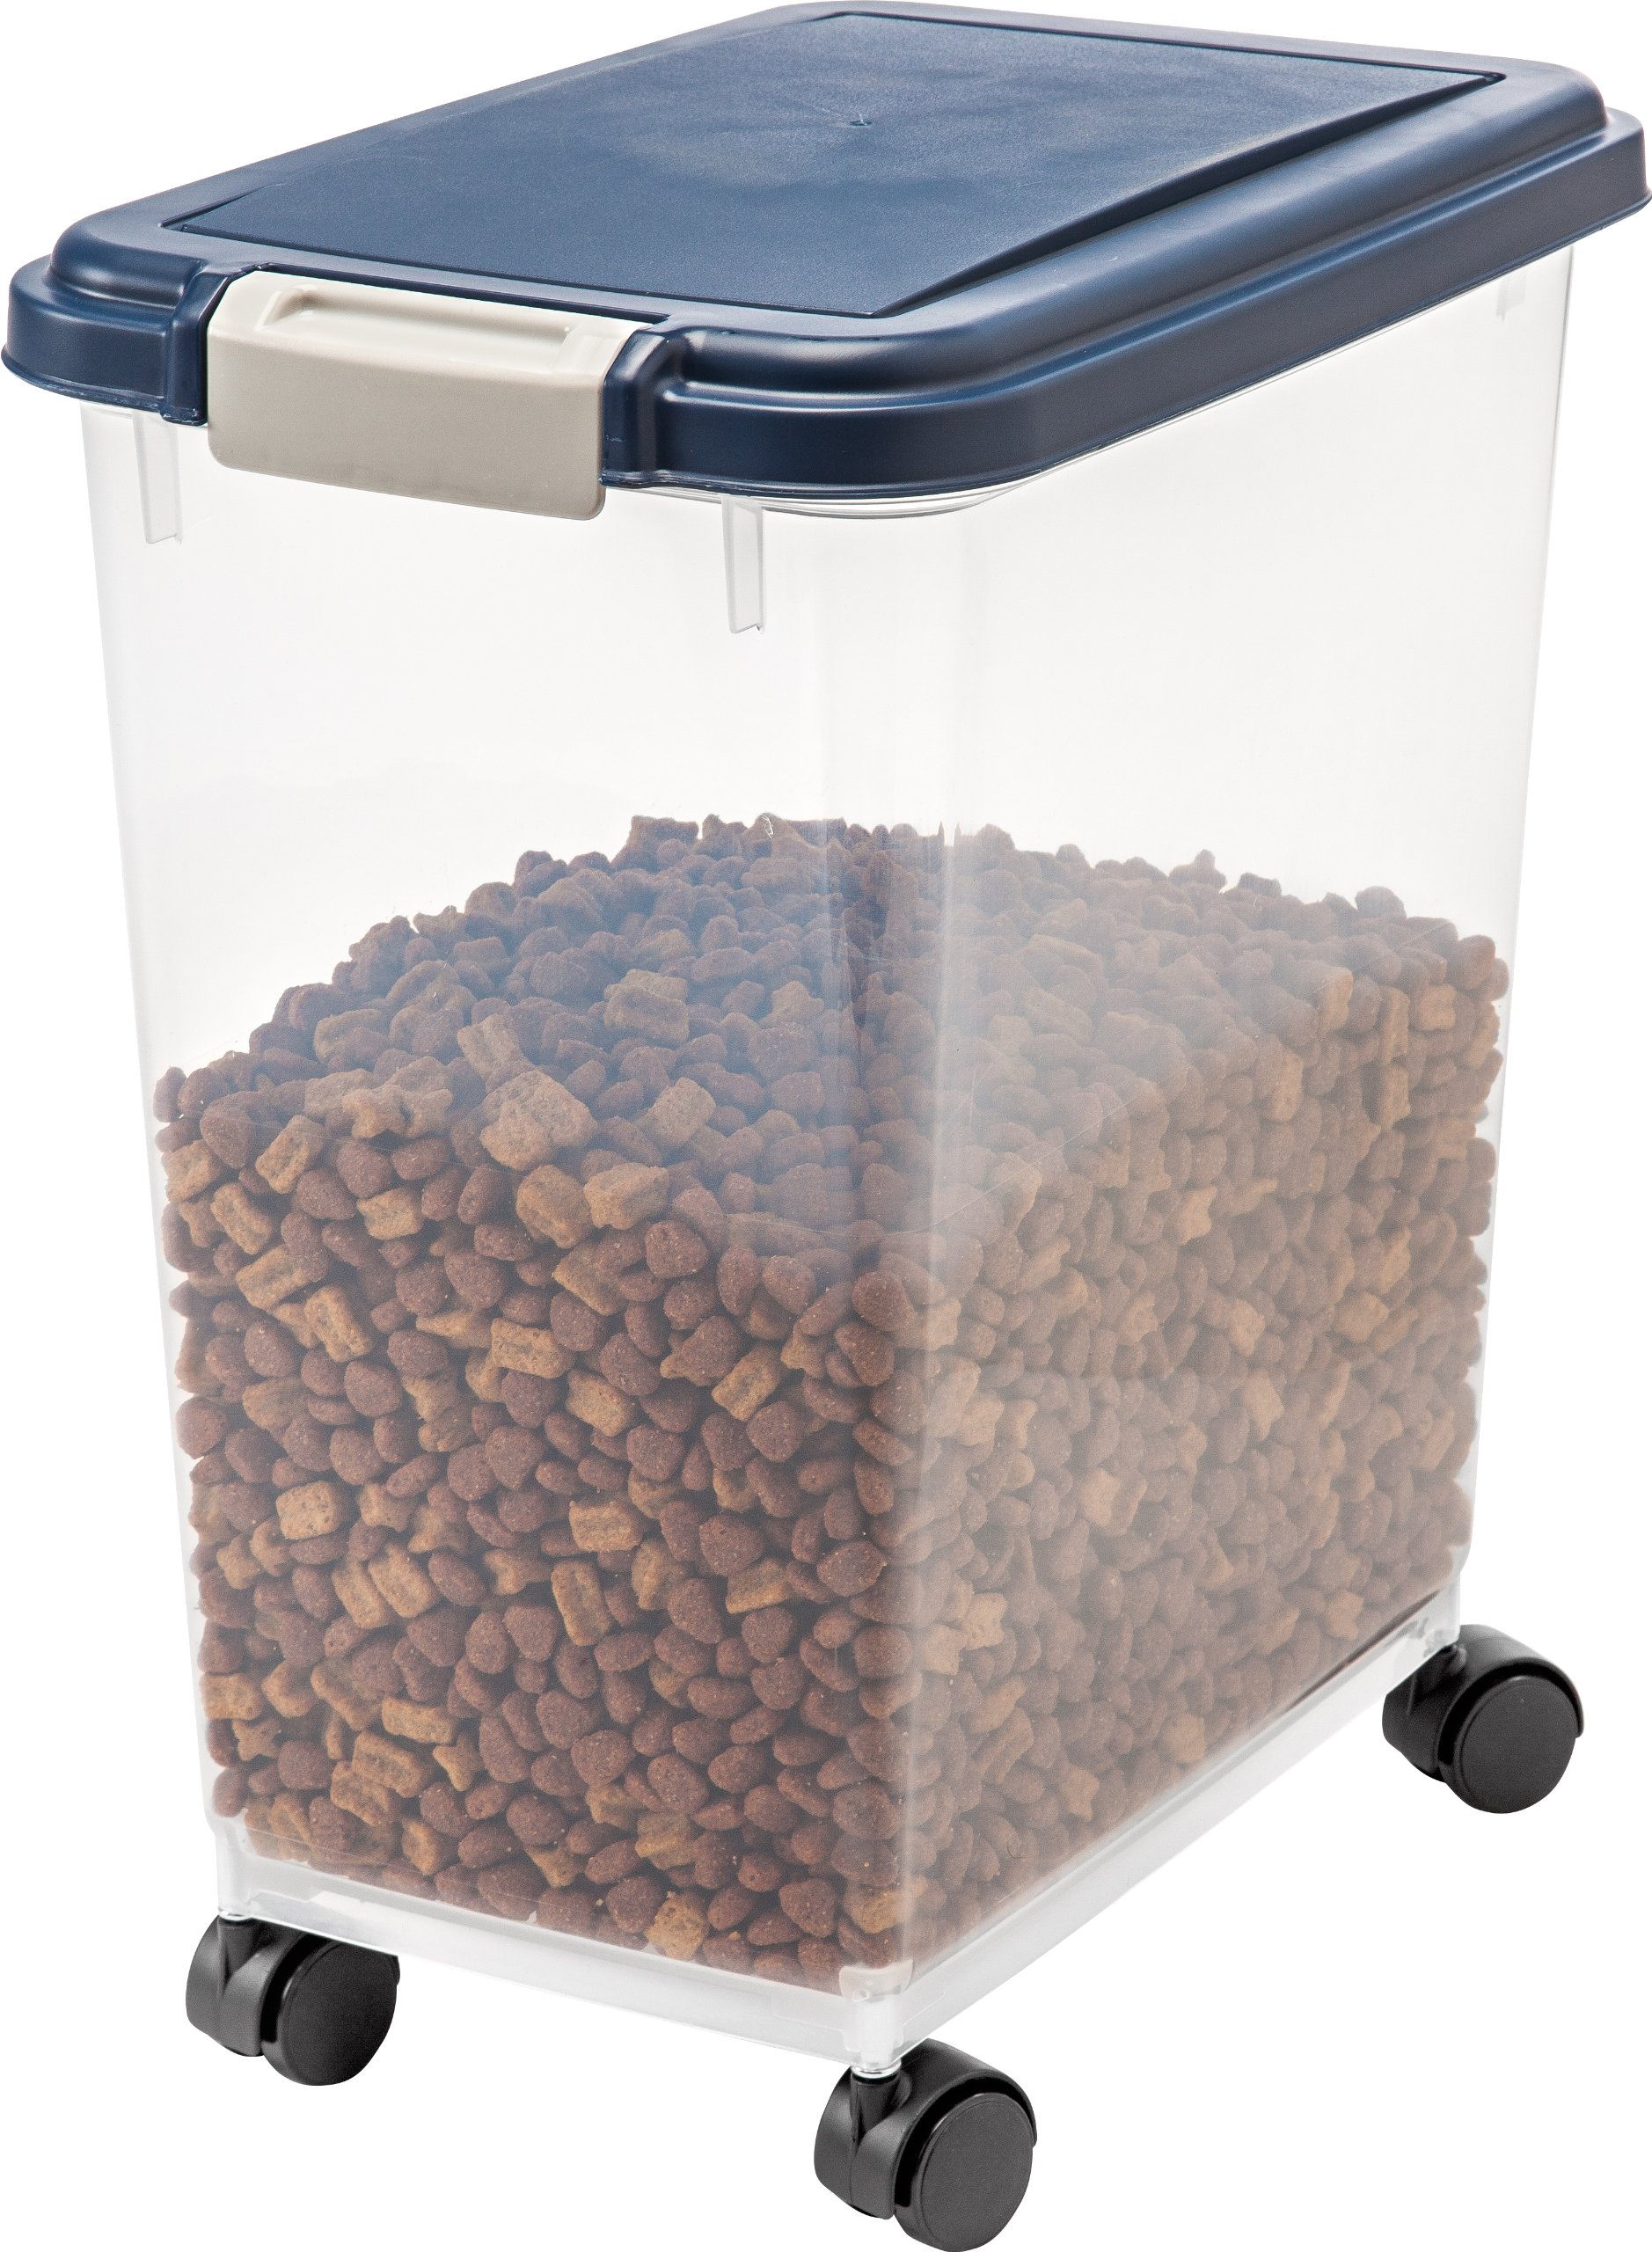 iris airtight pet food storage container 689997302559 ebay. Black Bedroom Furniture Sets. Home Design Ideas